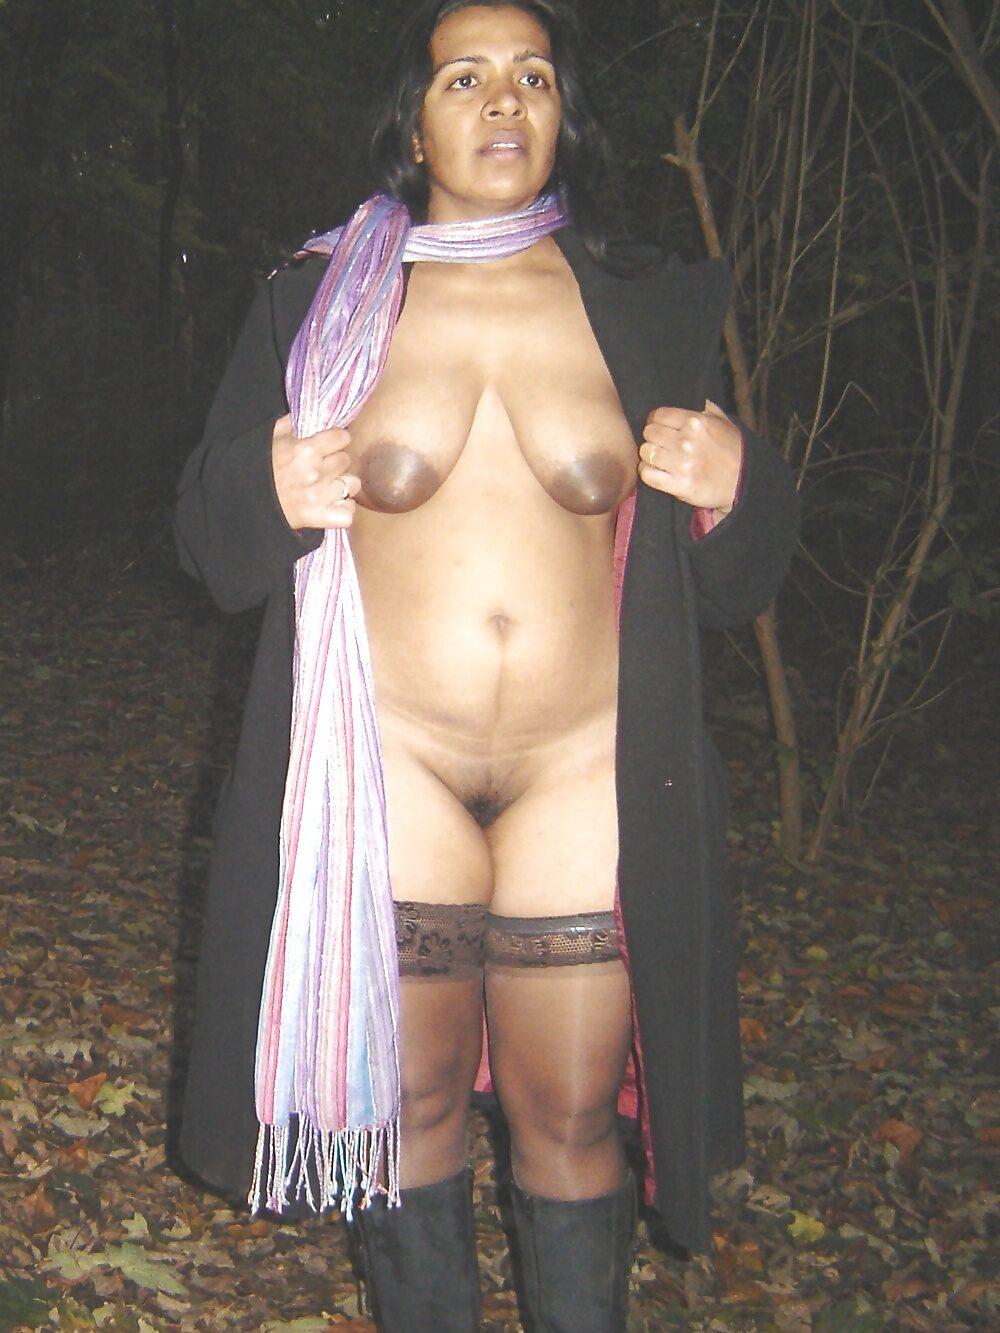 Riythvika Desi Indian Milf Loves Exposing Herself Outdoors 15 Pics best porn